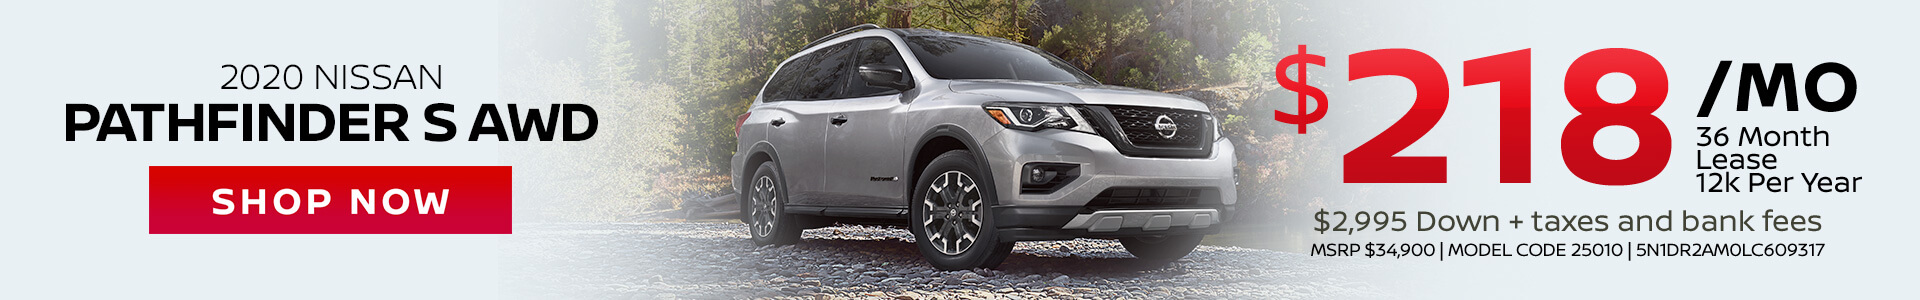 Nissan Pathfinder $218 Lease